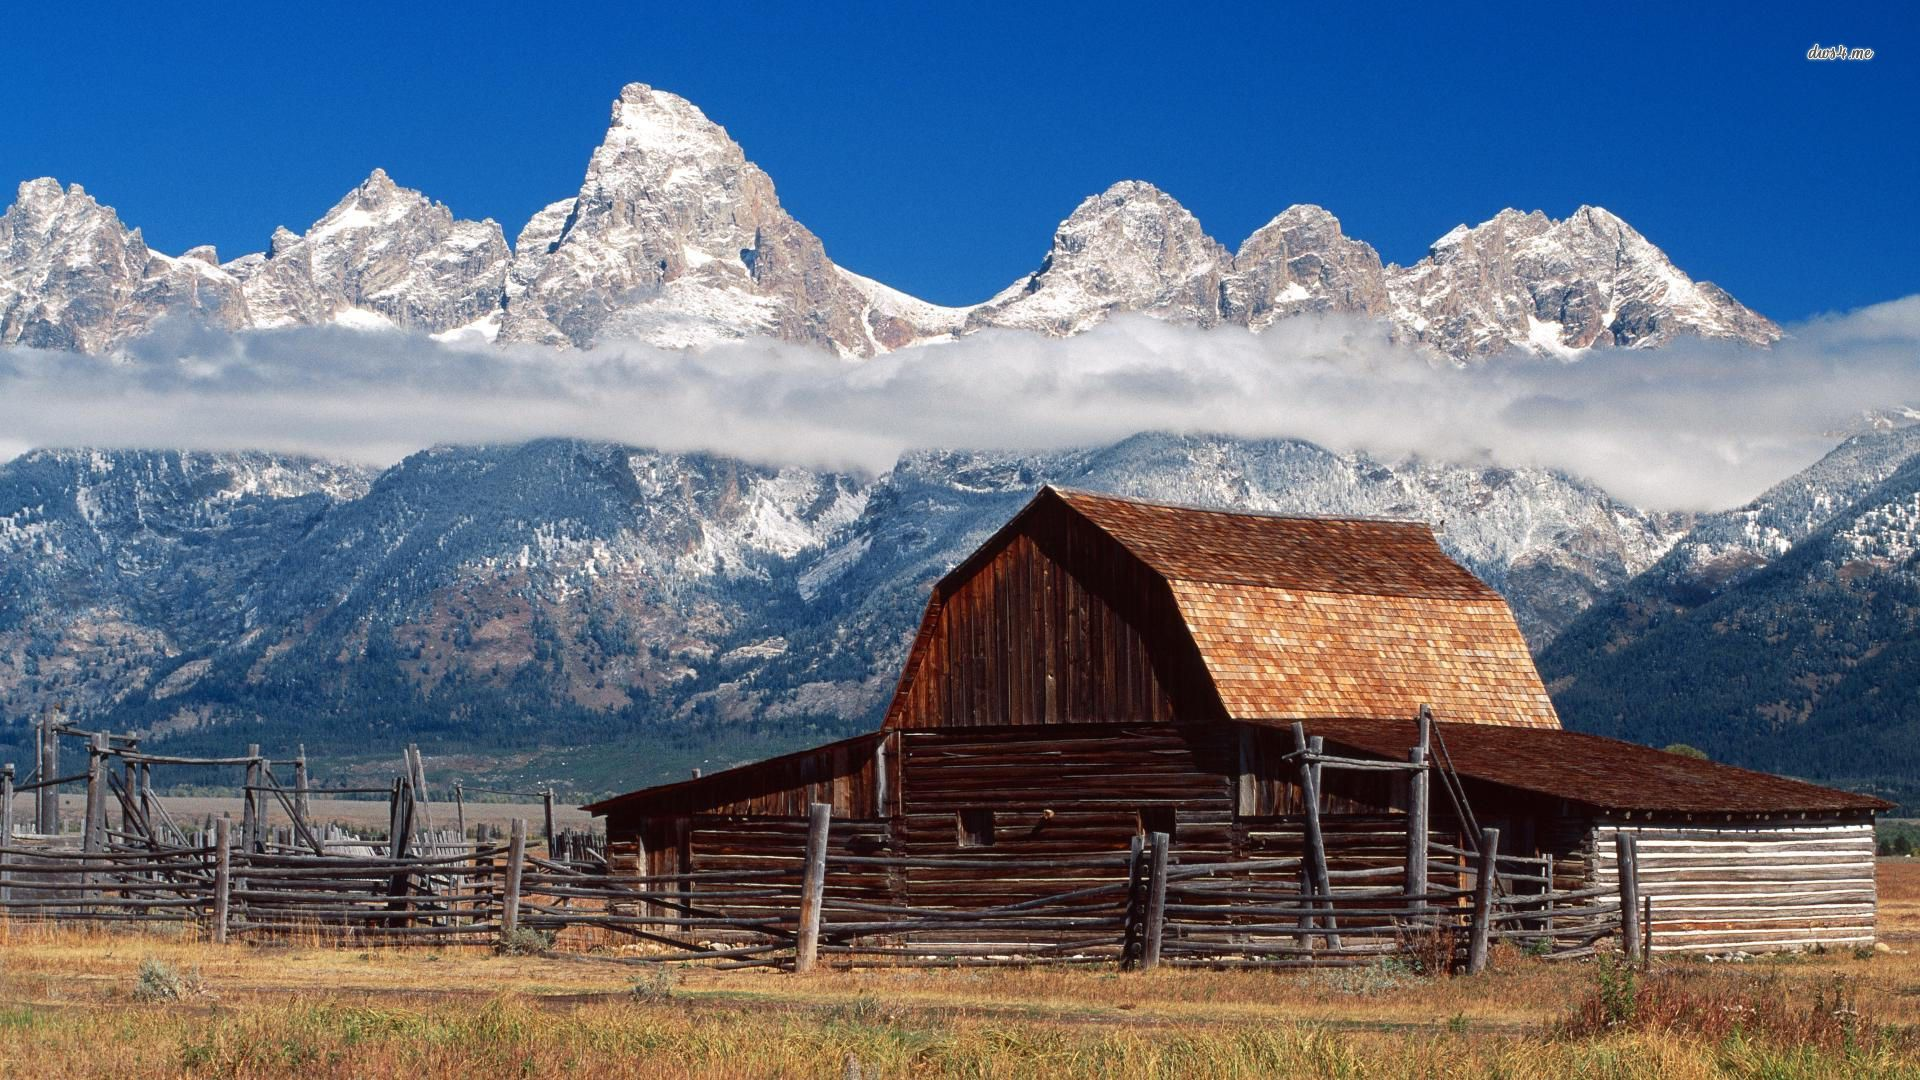 Teton Barn Jackson Hole Wyoming Nature Wallpaper #105085 - Resolution 1920x1080 px